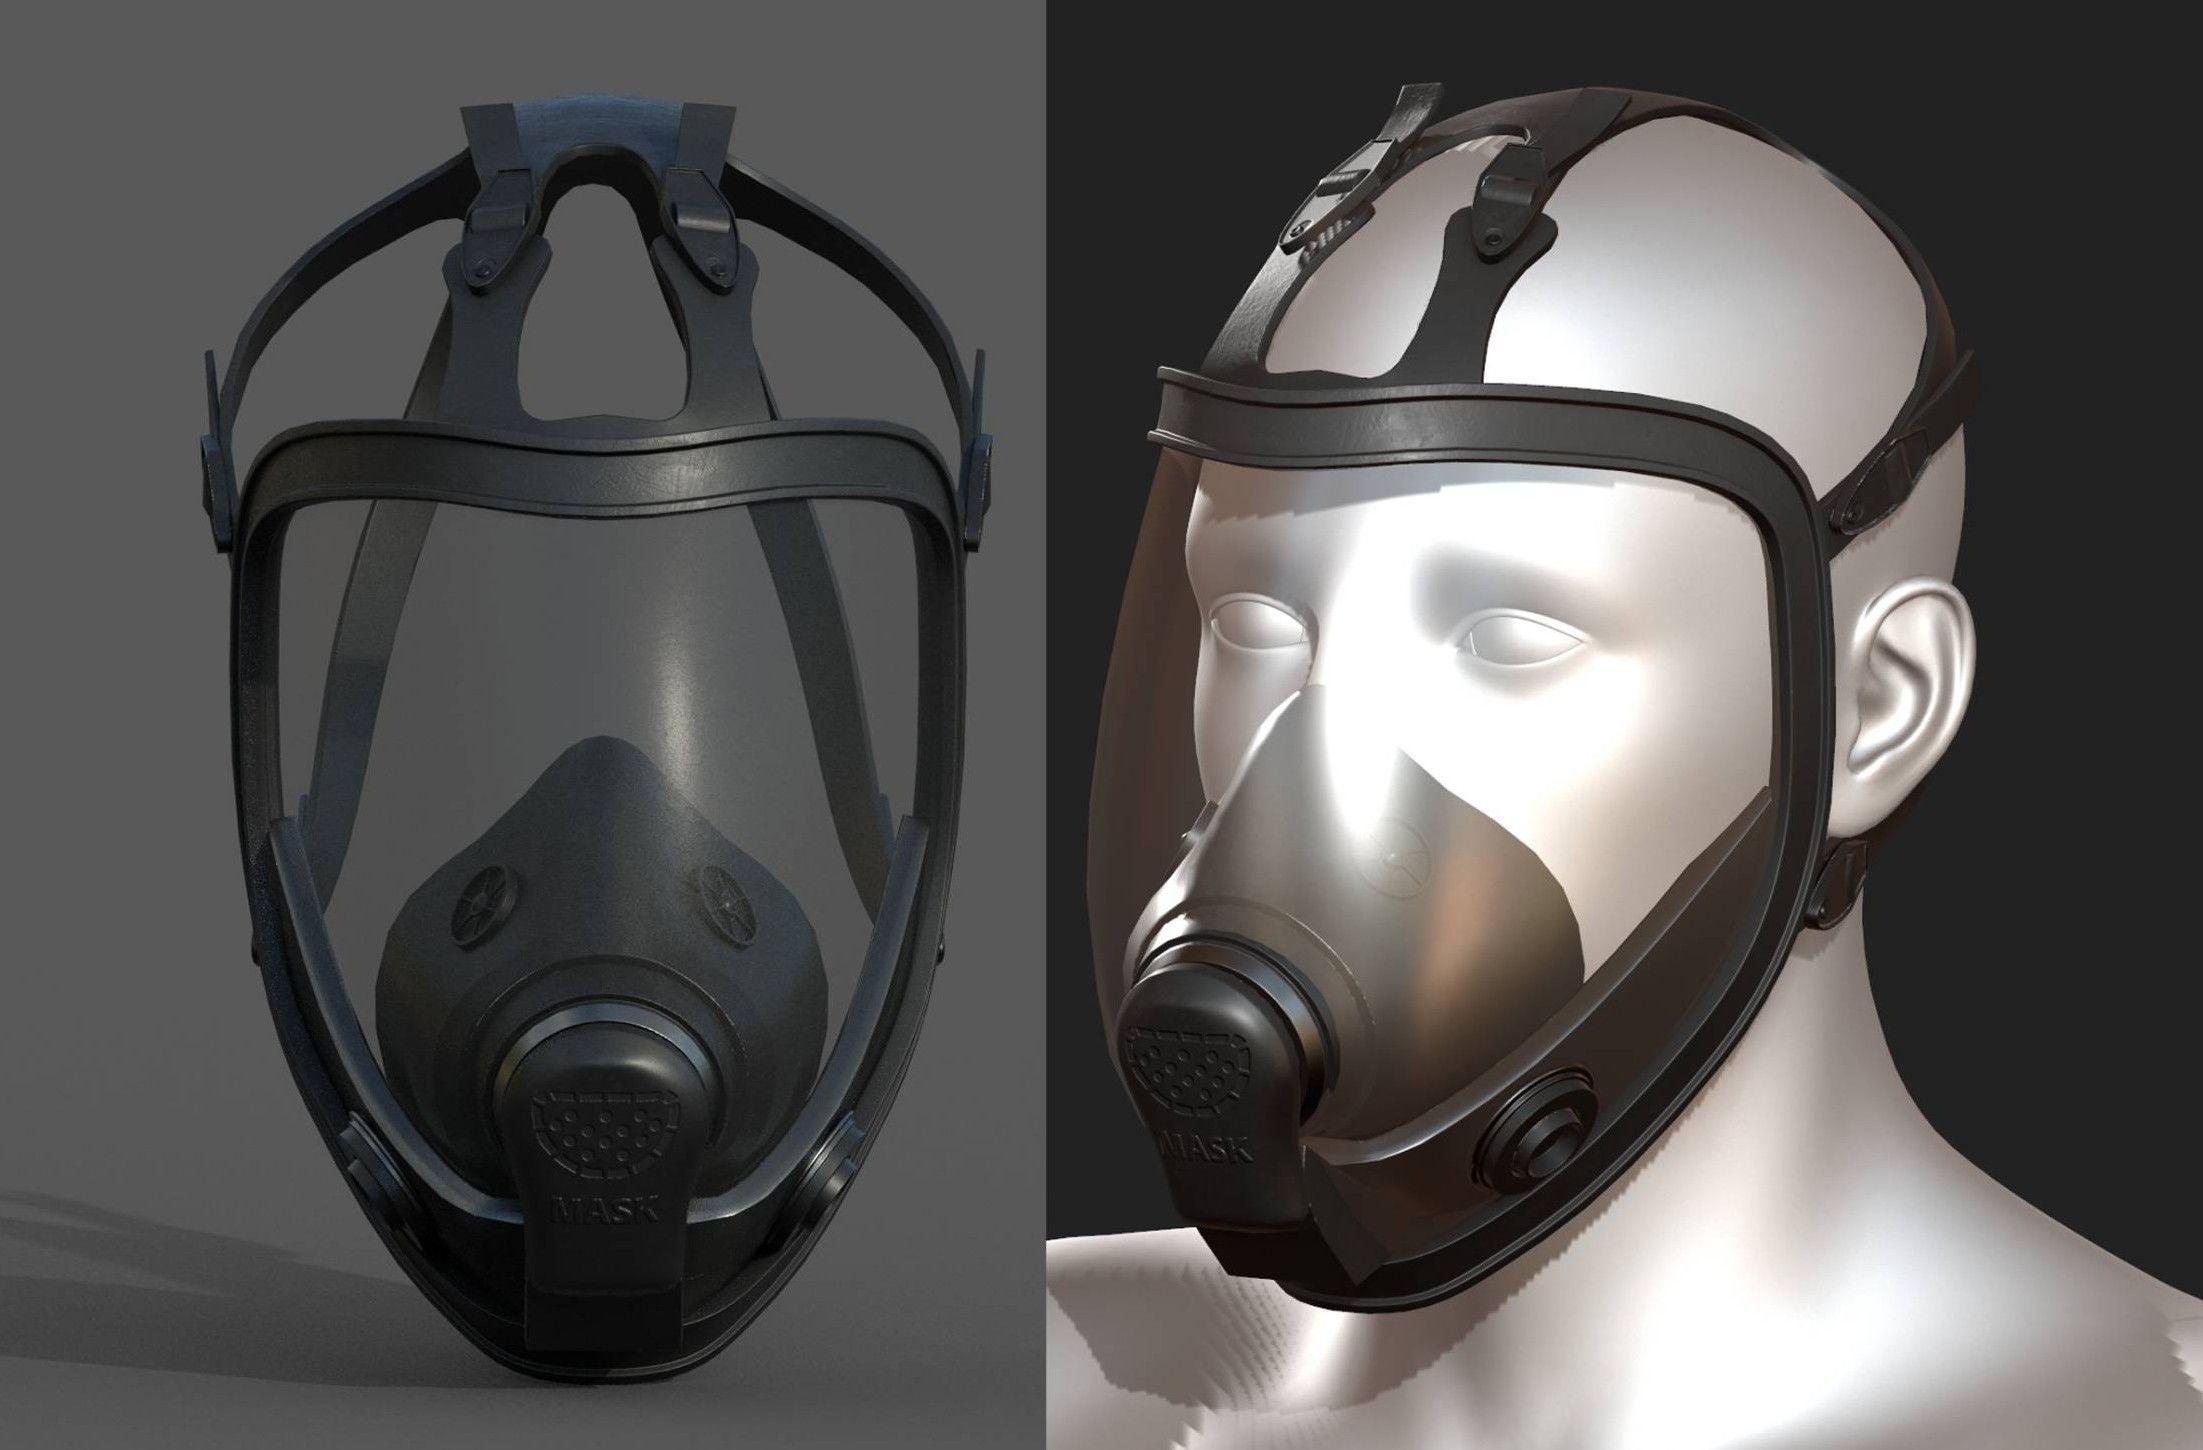 Gas mask black protection futuristic technology